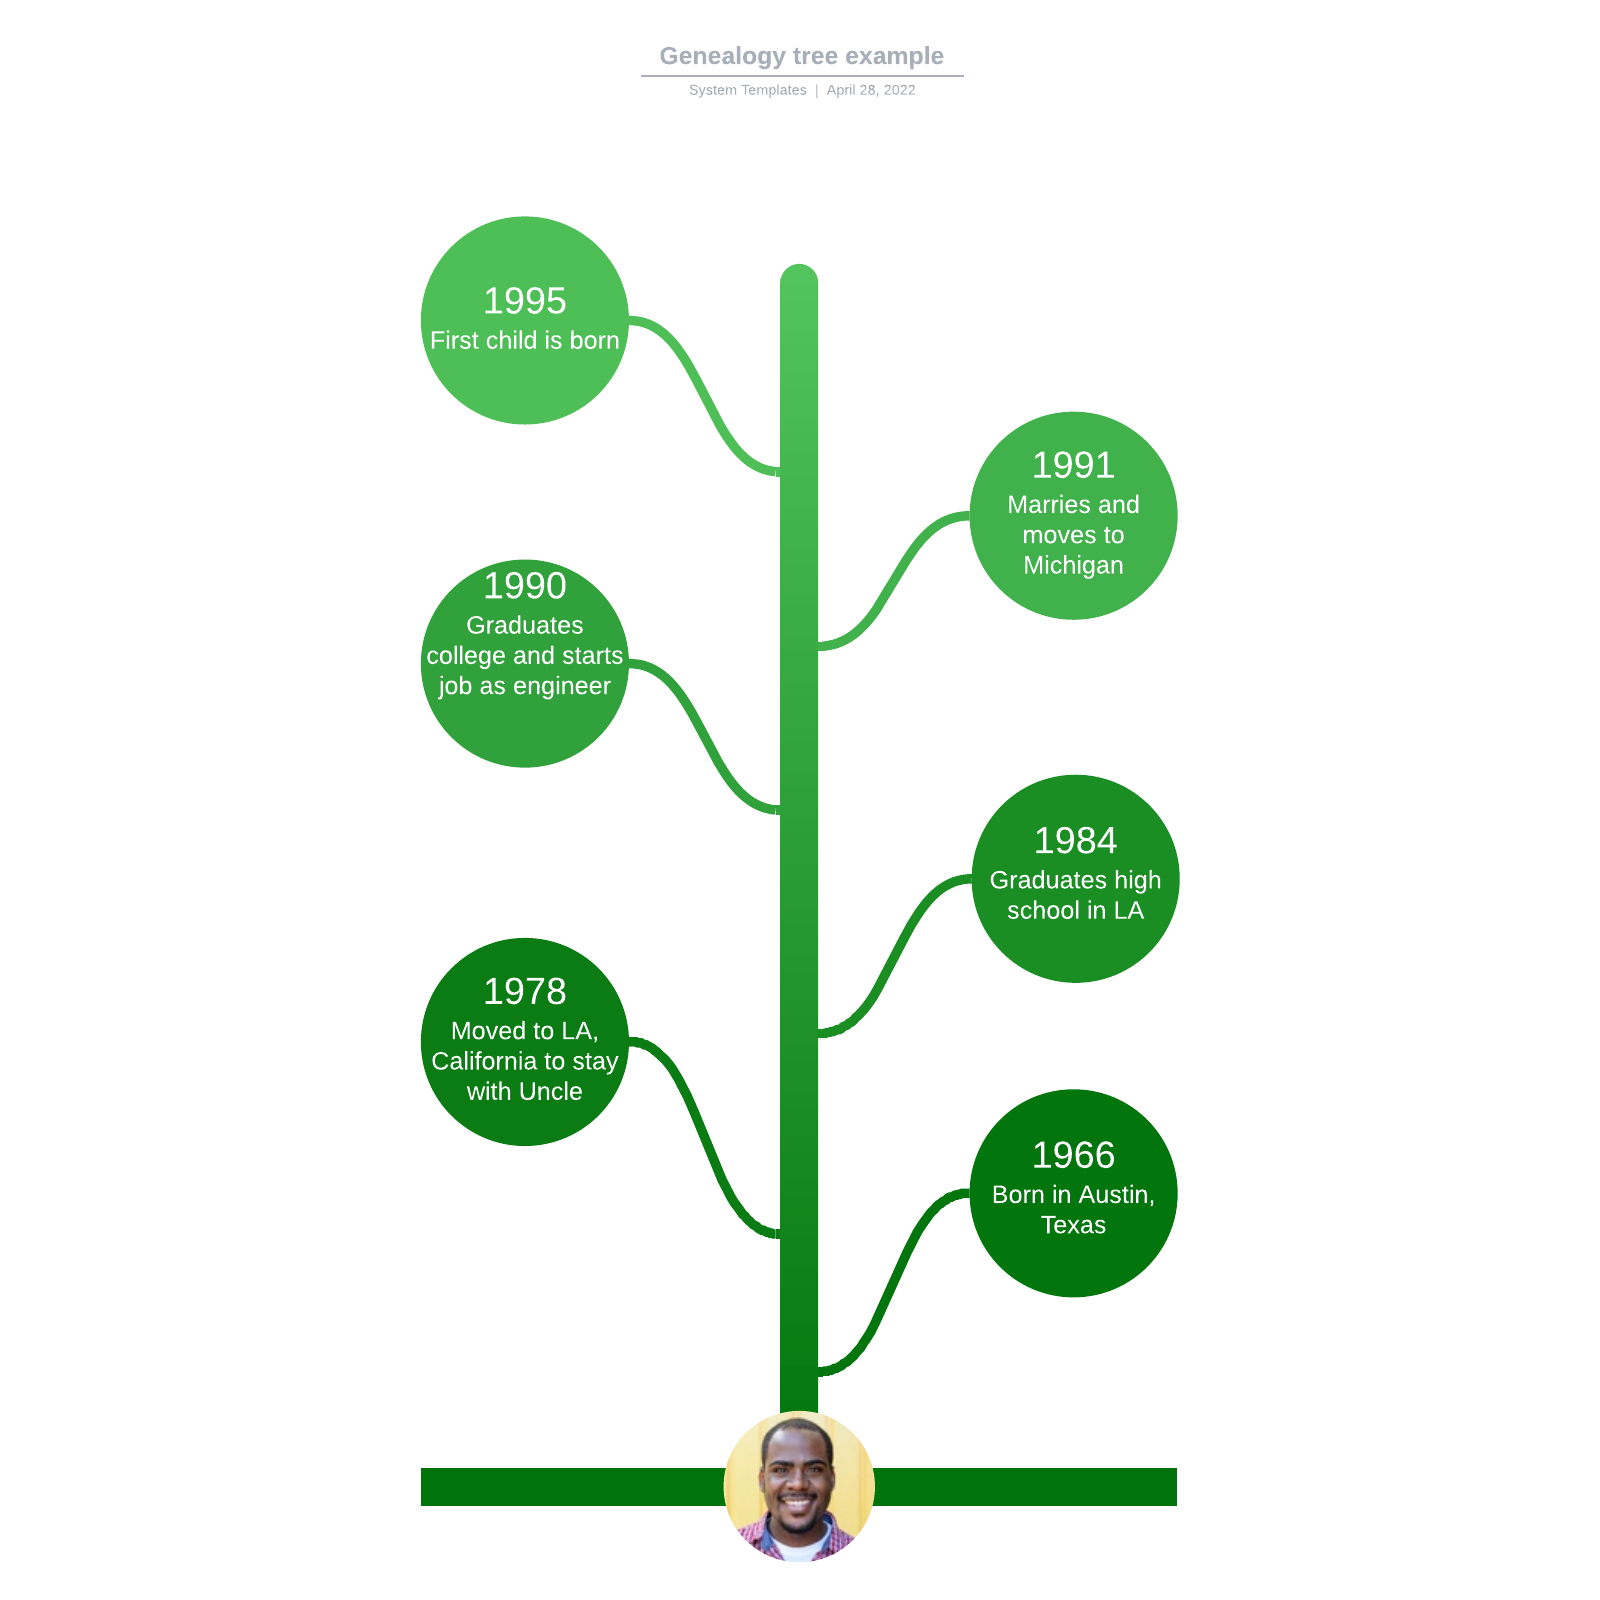 Genealogy tree example